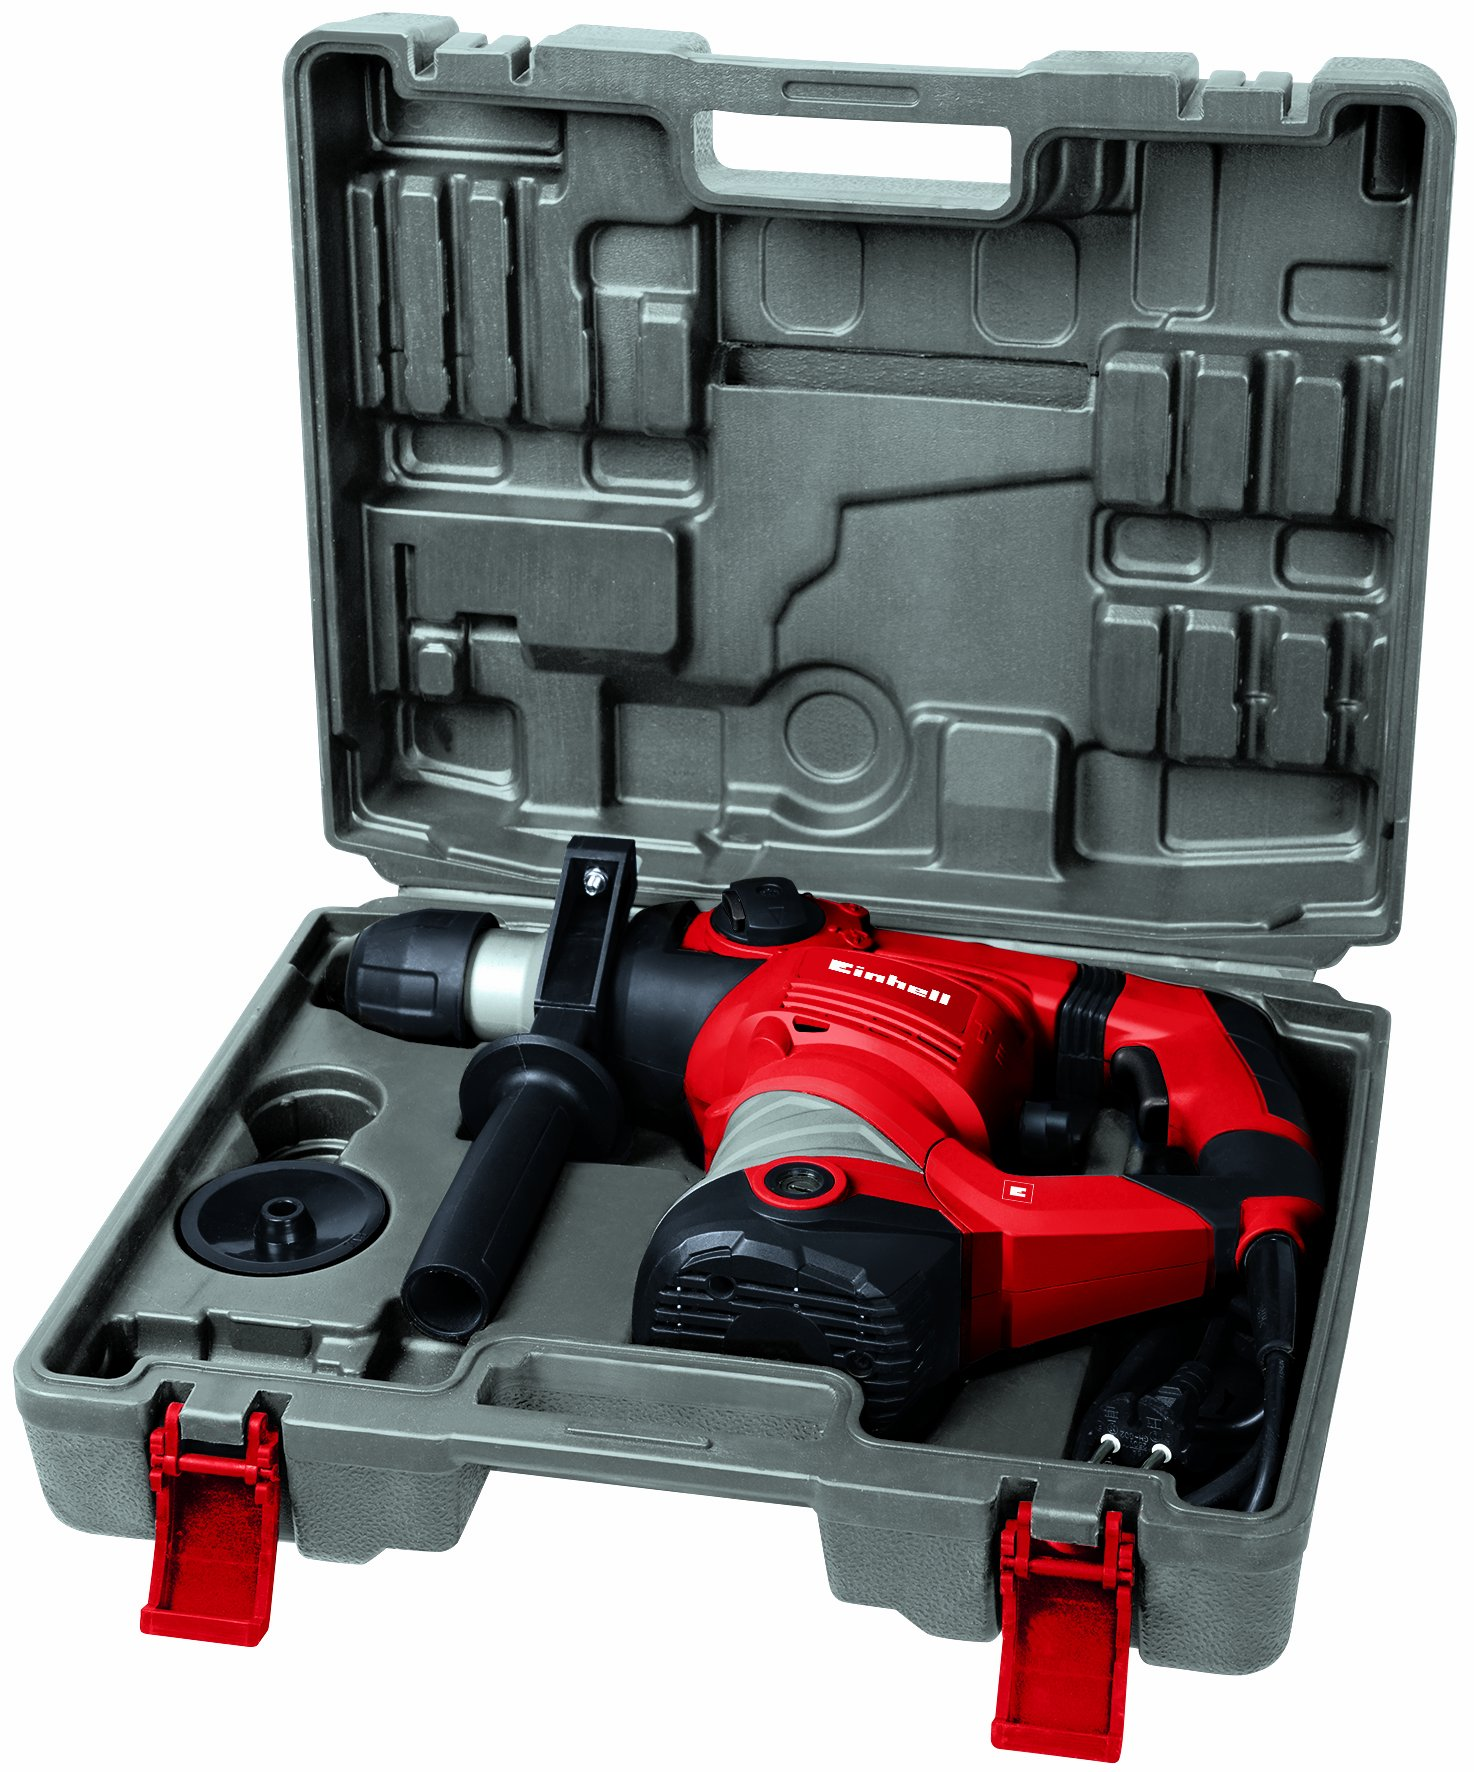 Einhell TC-RH 1600 Martillo Electroneumatico, Potencia 1600 W, Rojo (ref. 4258478)